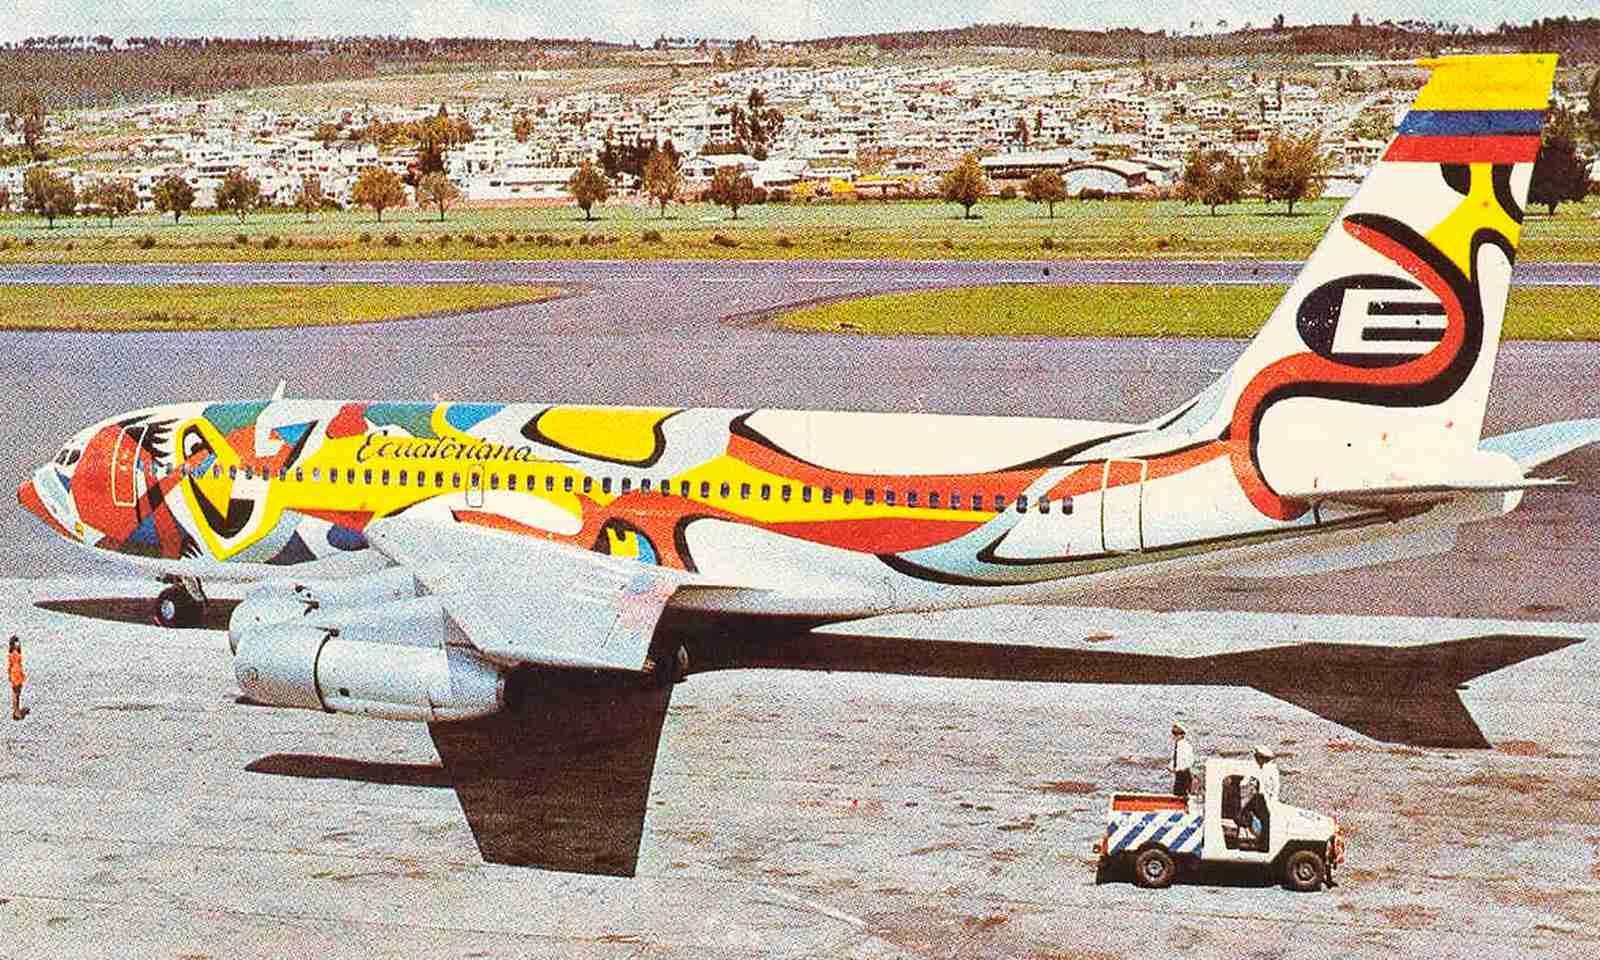 An Ecuatoriana Boeing 720, a version of the 707.